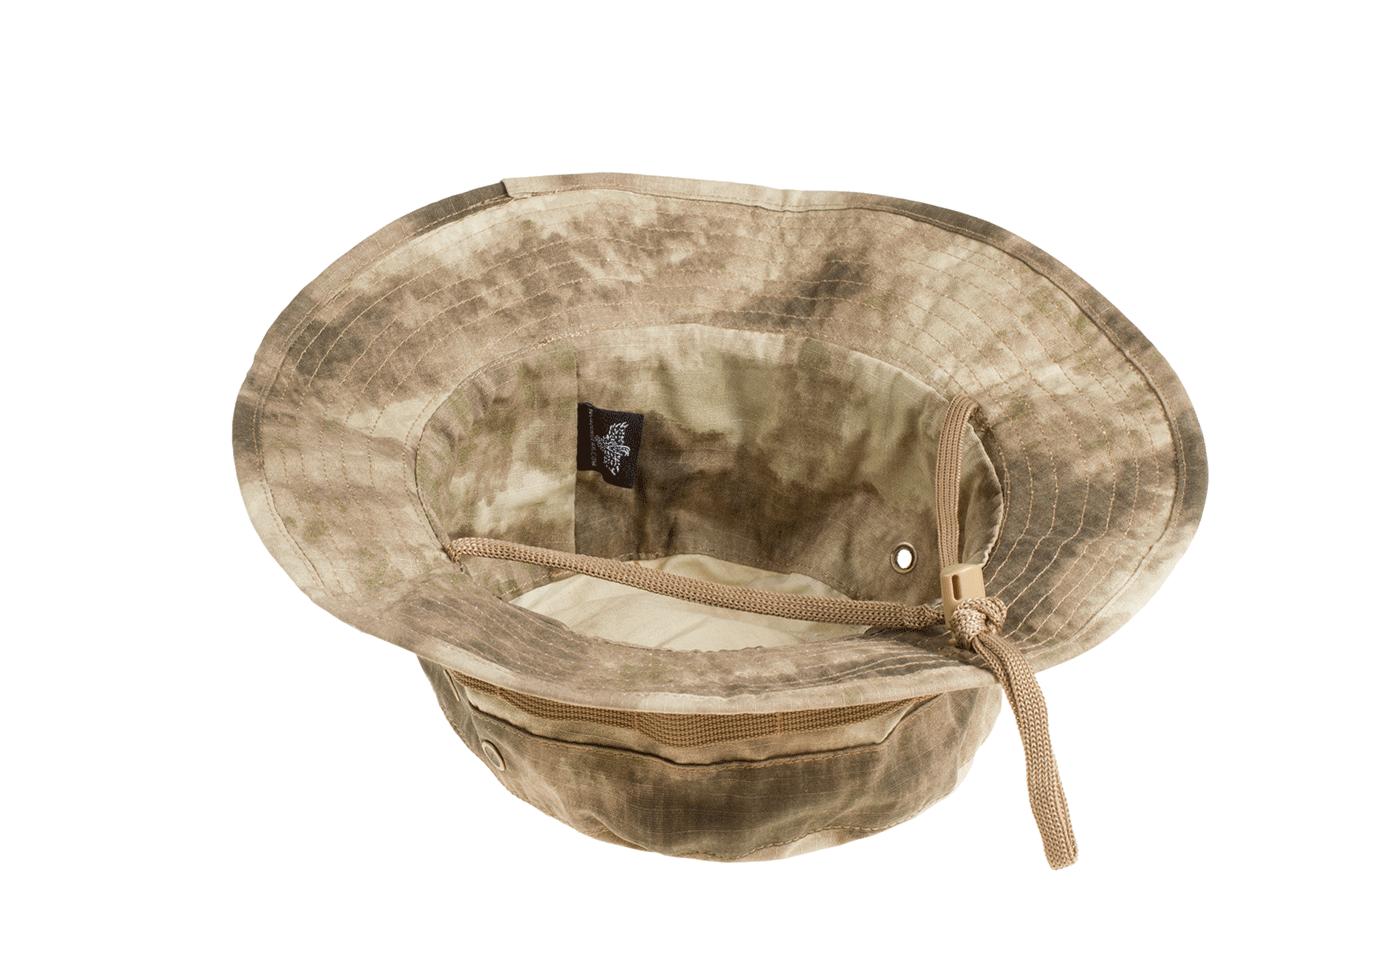 1f1a5a5914d Boonie Hat Stone Desert 59   L - Boonies - Headwear - Garments -  invadergear.ch Online shop